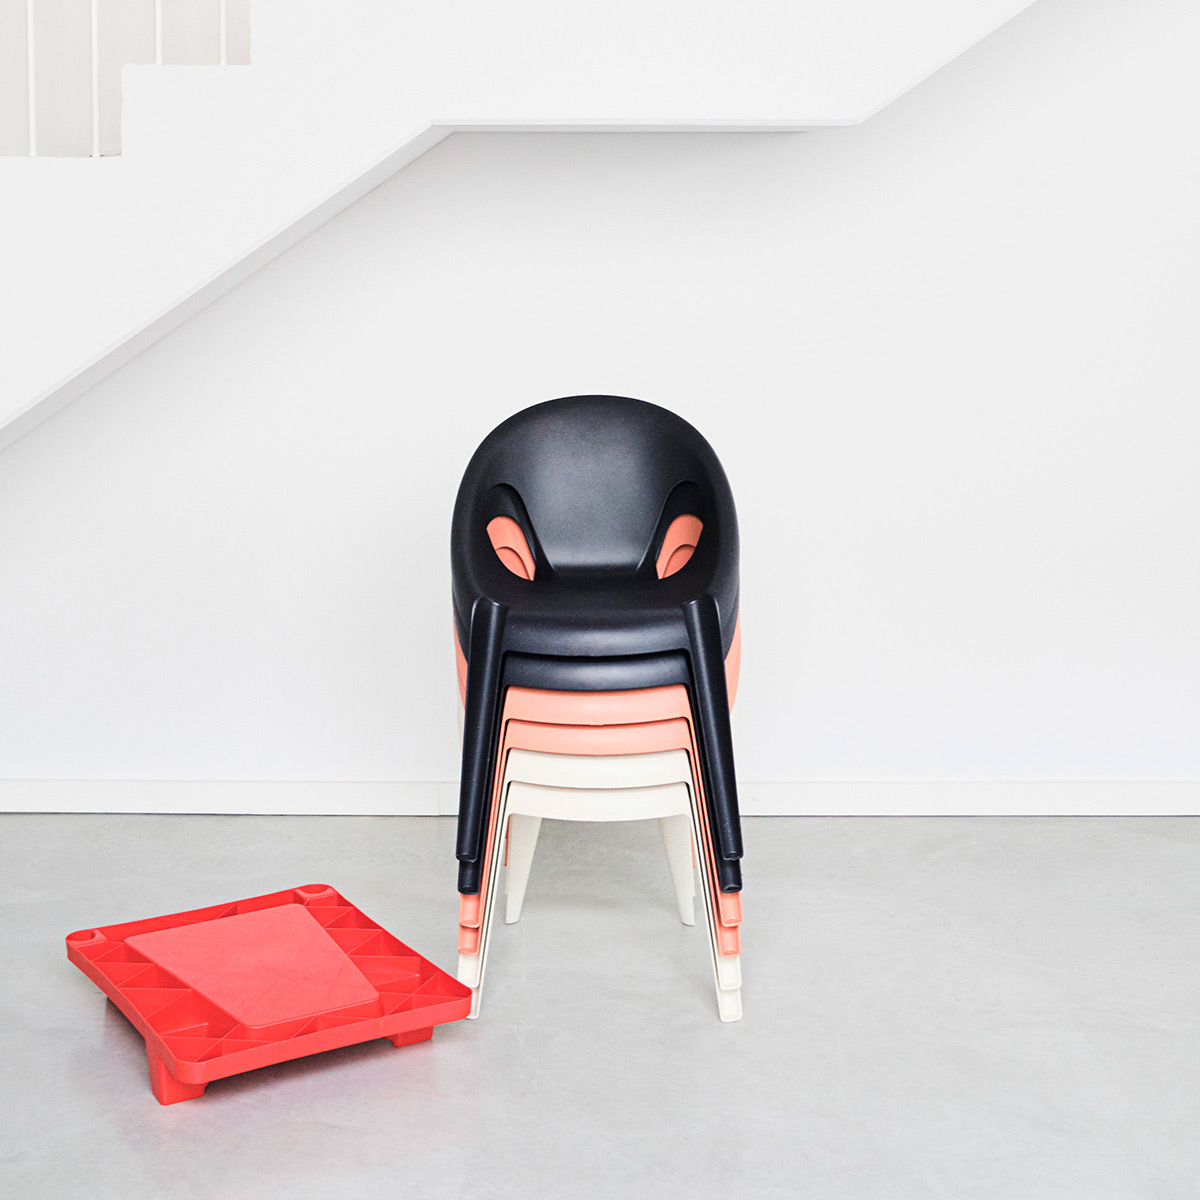 Belle-chair-Konstantin-Grcic-Magis-03